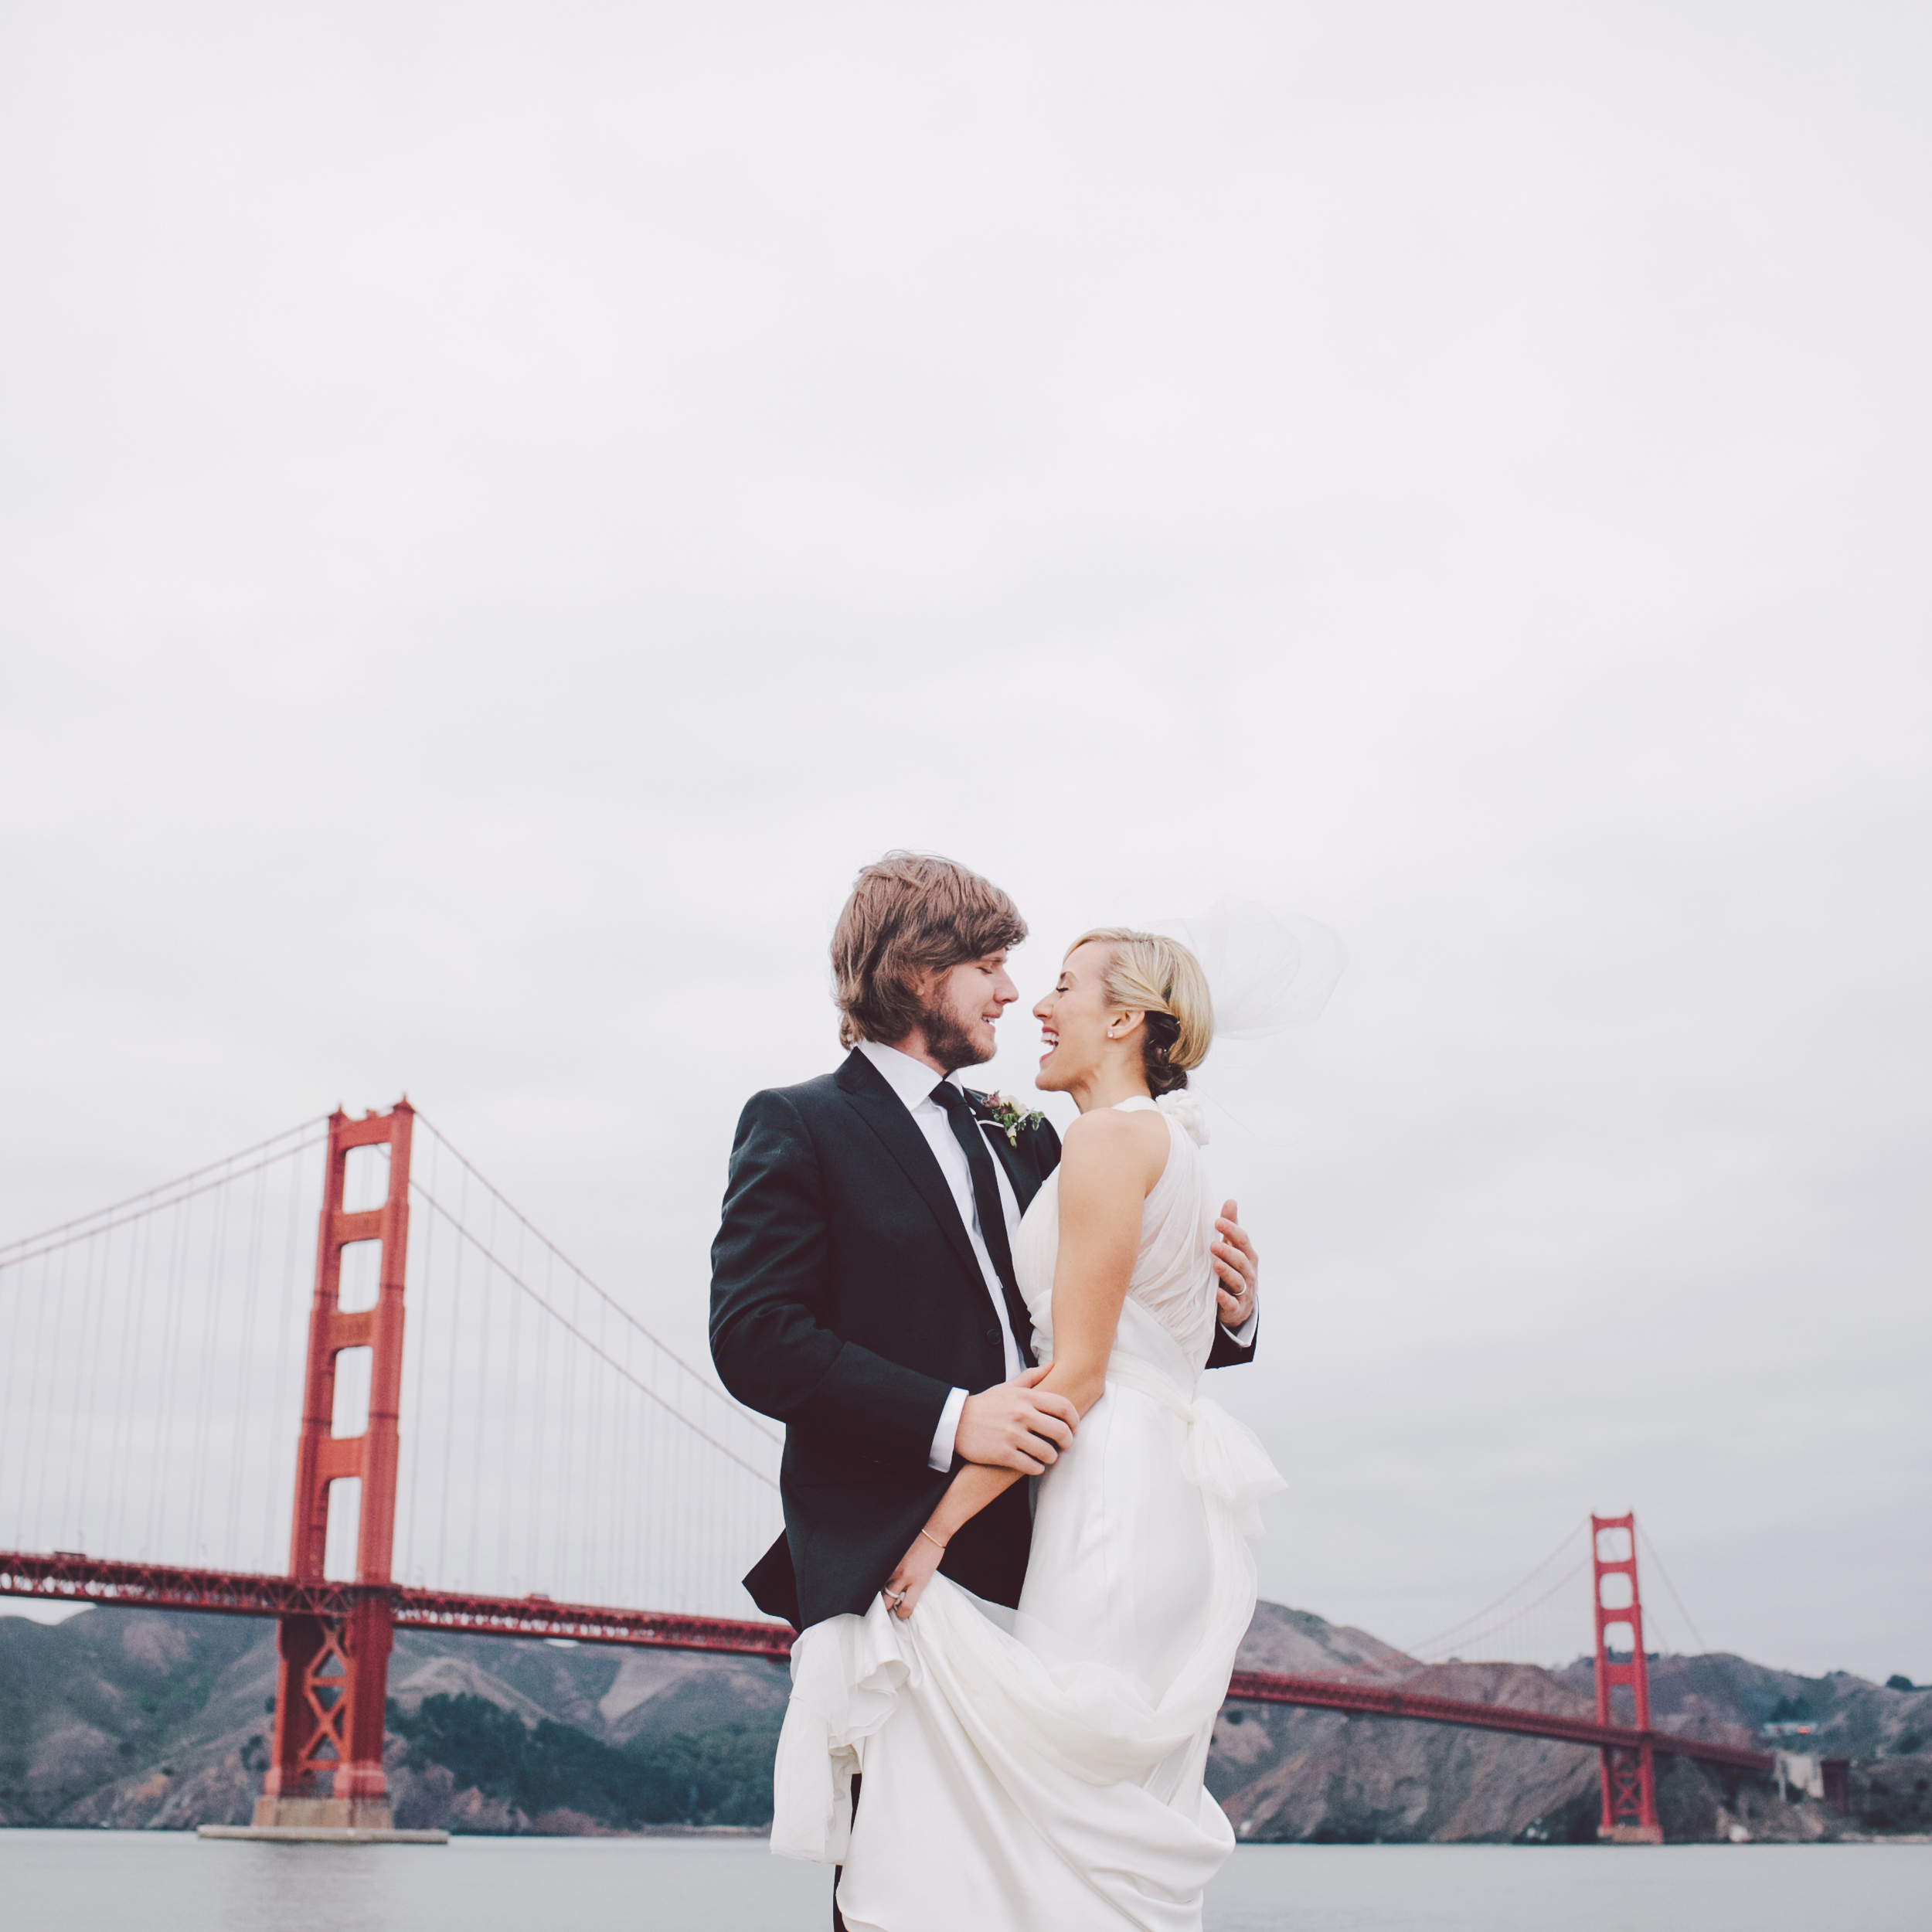 SF CITY HALL CABLE CAR WEDDING